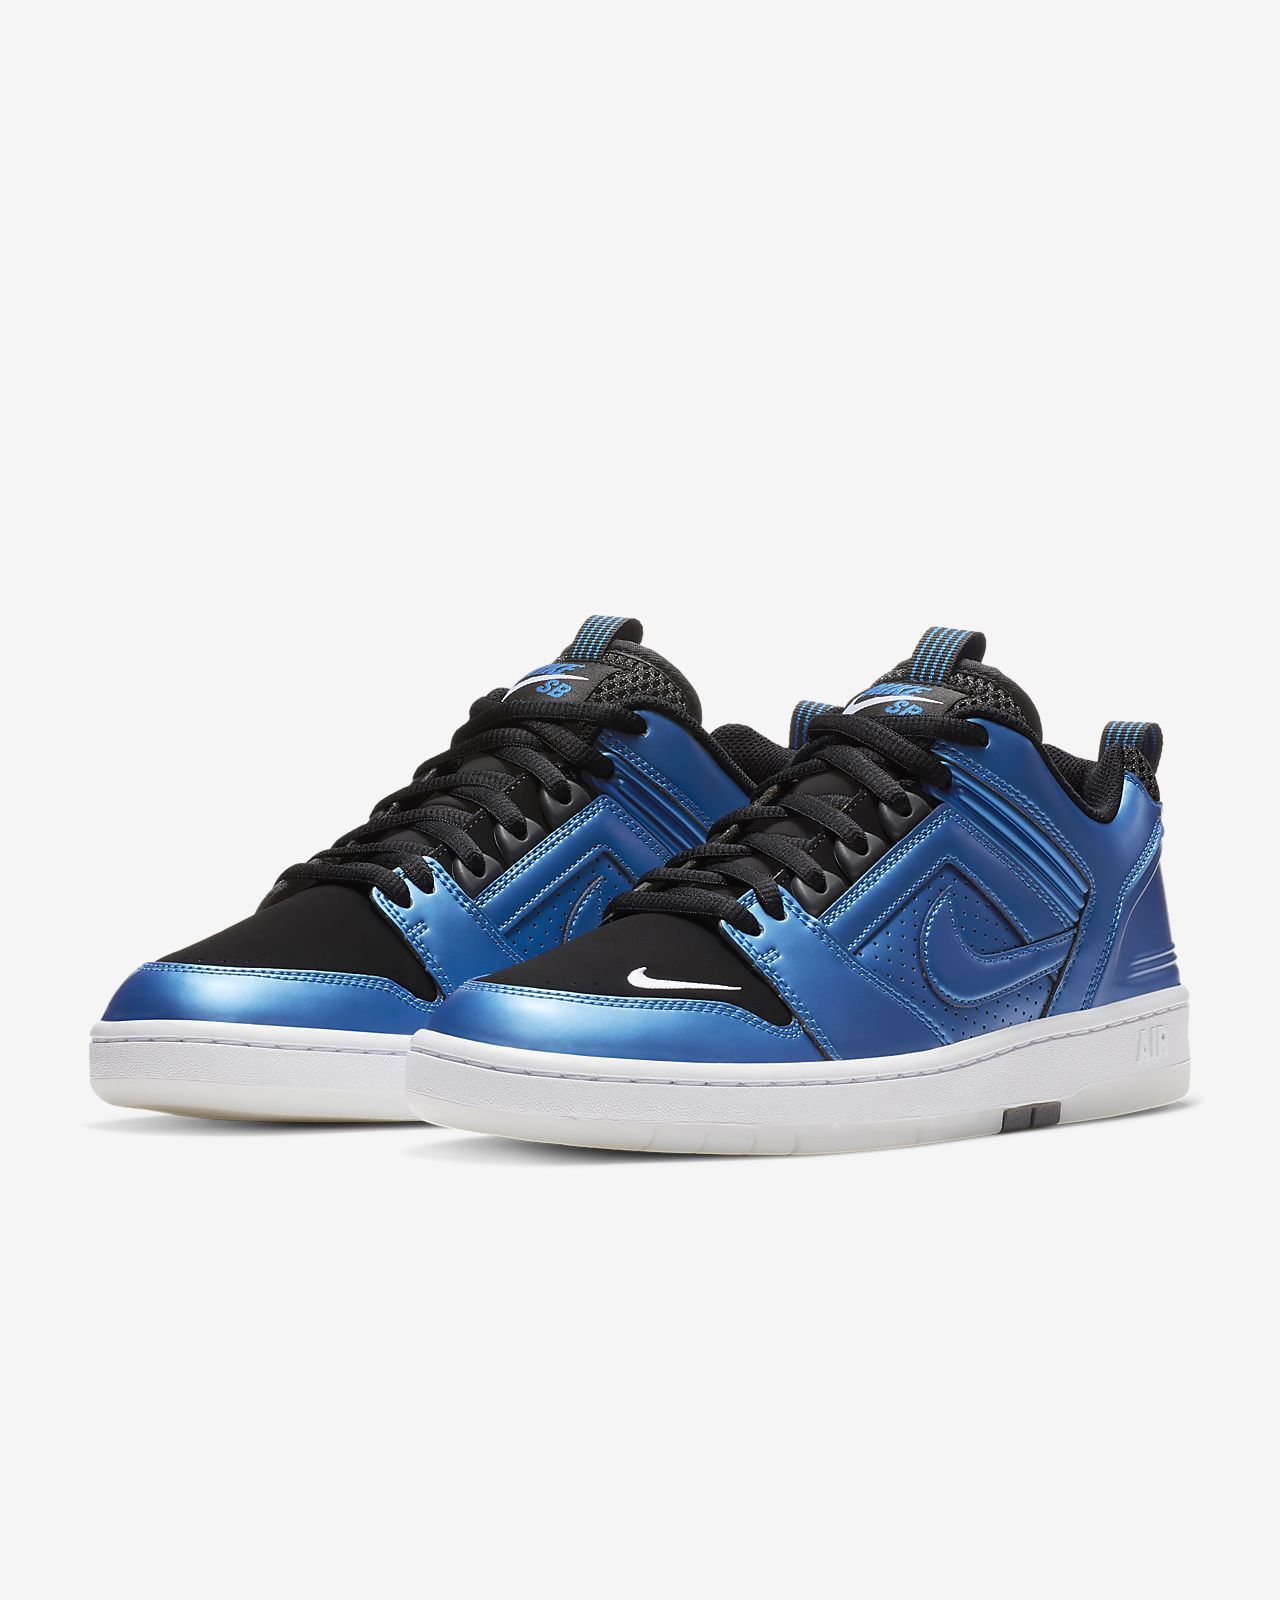 promo code d0ba1 a0eb4 ... Nike SB Air Force 2 Low Mens Skate Shoe